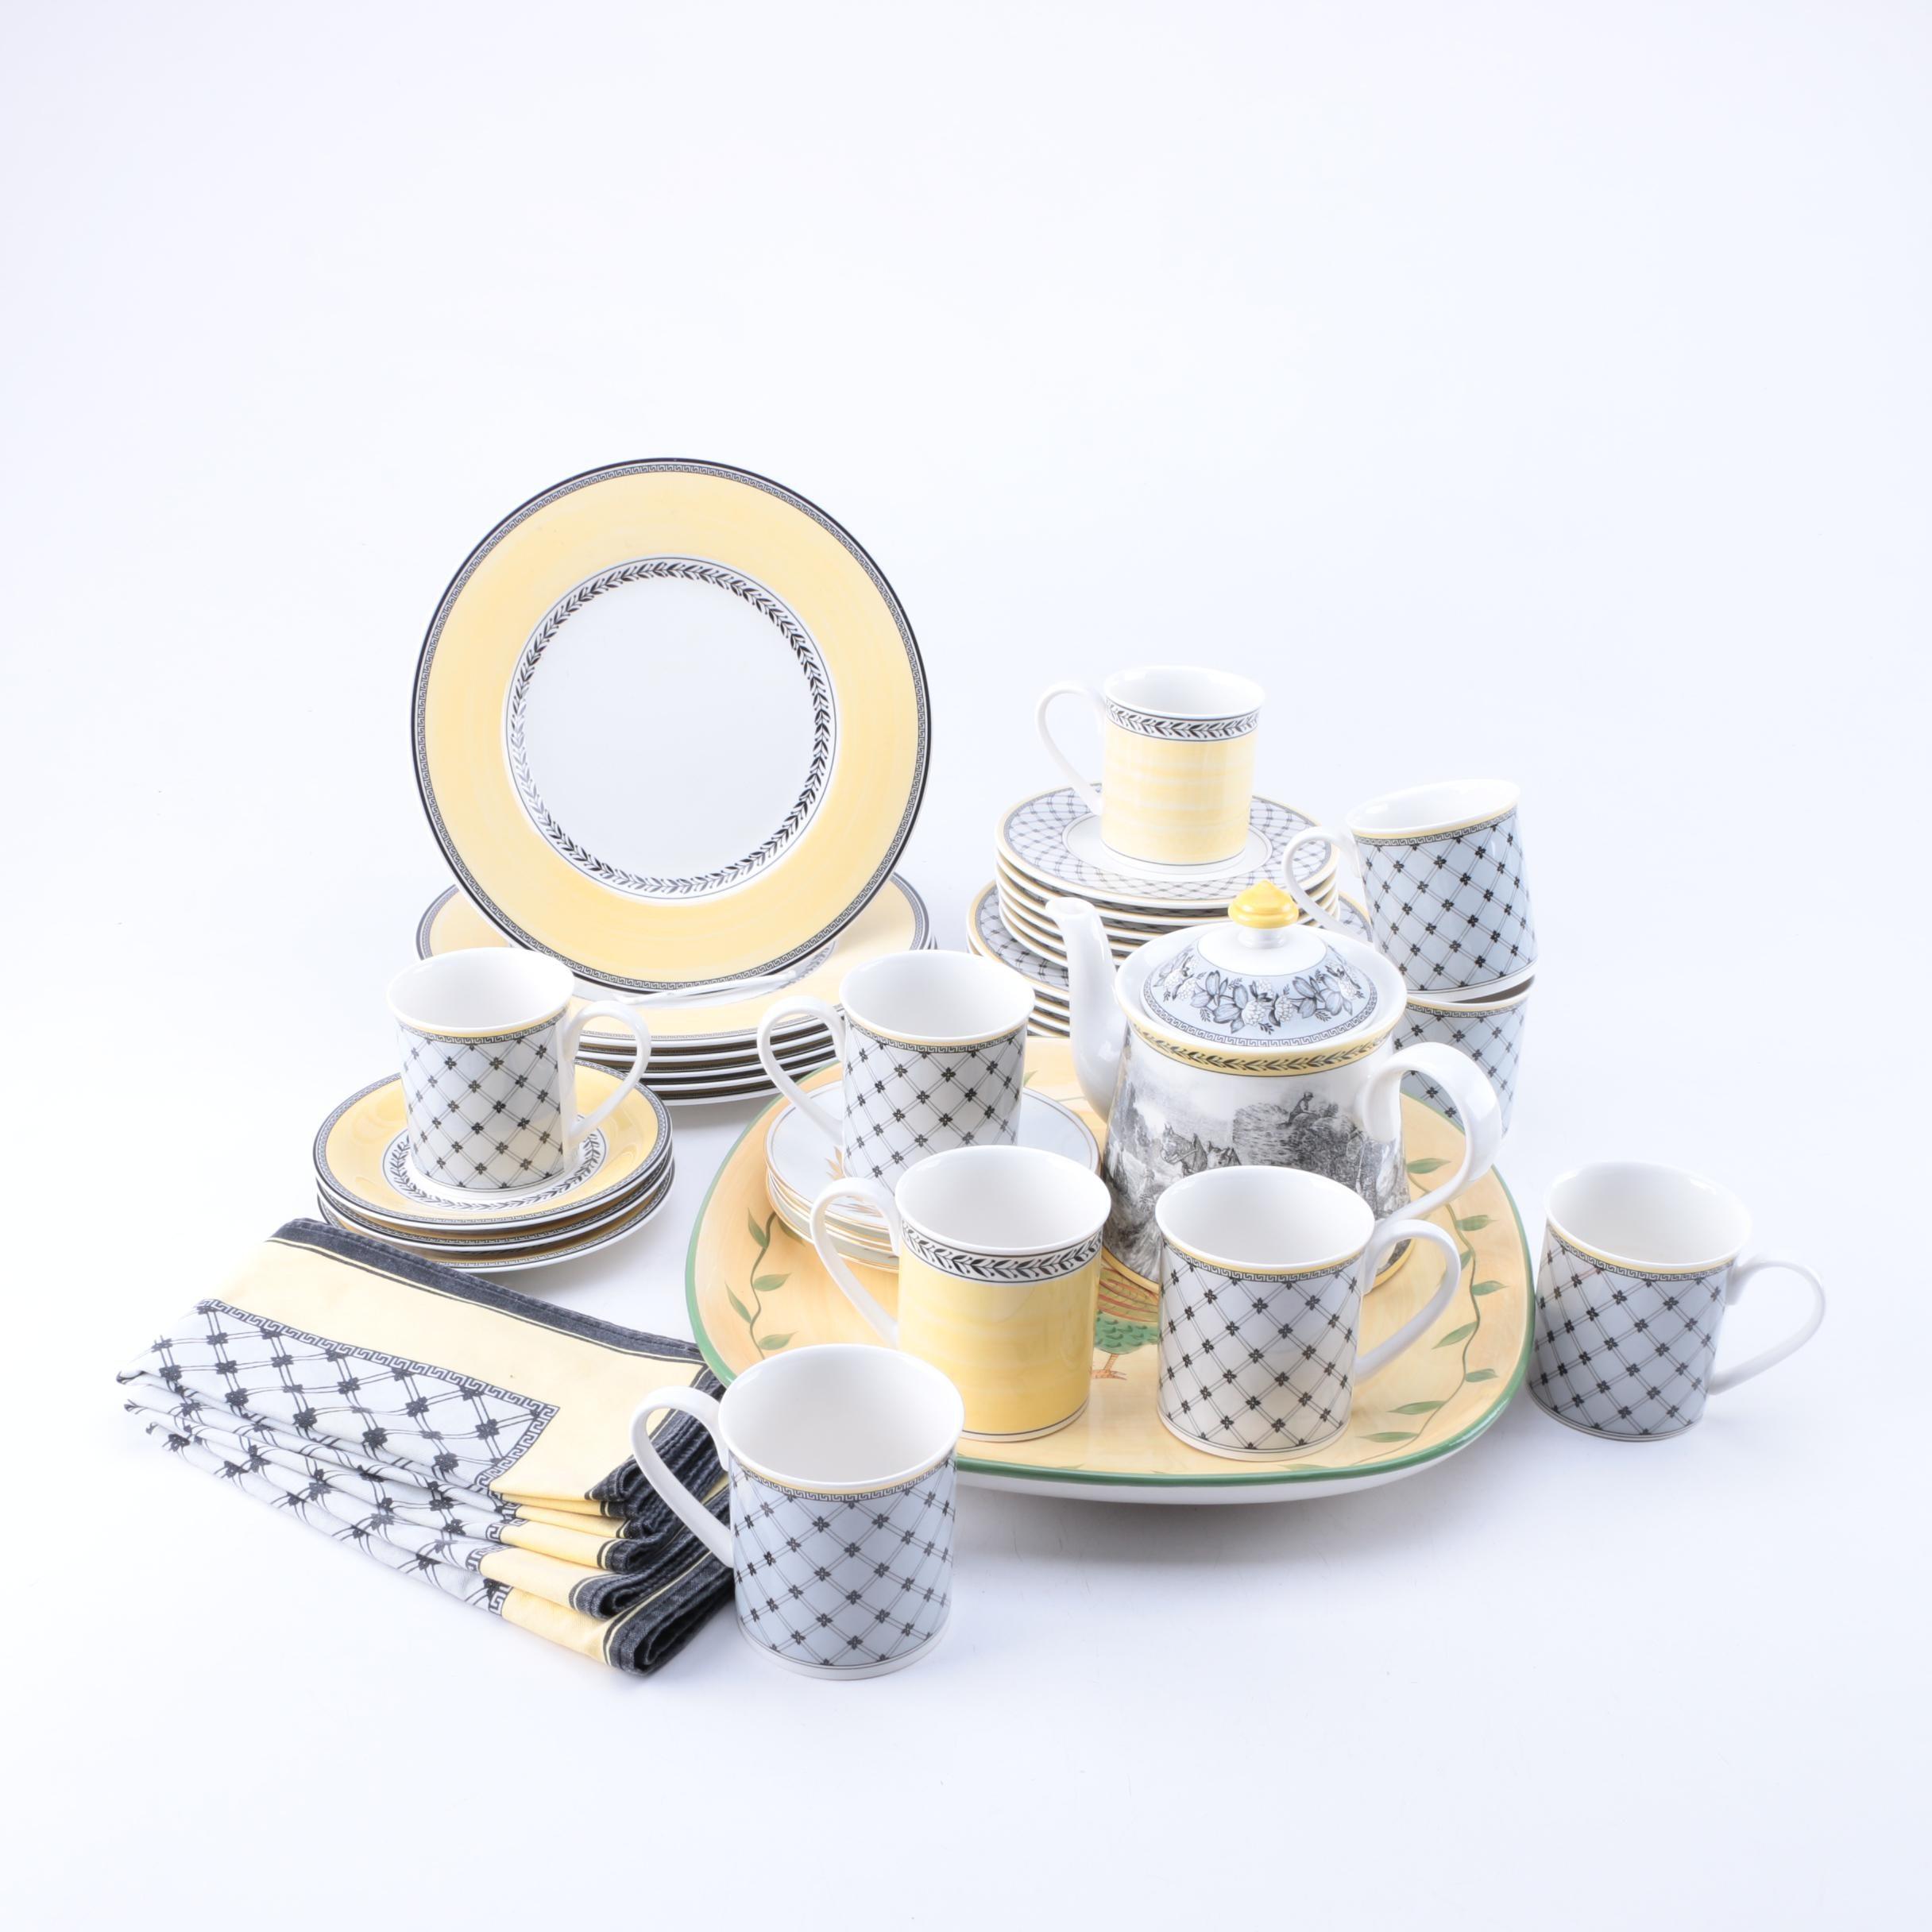 Villeroy u0026 Boch  Audun Fleur  Tableware ...  sc 1 st  EBTH.com & Villeroy u0026 Boch